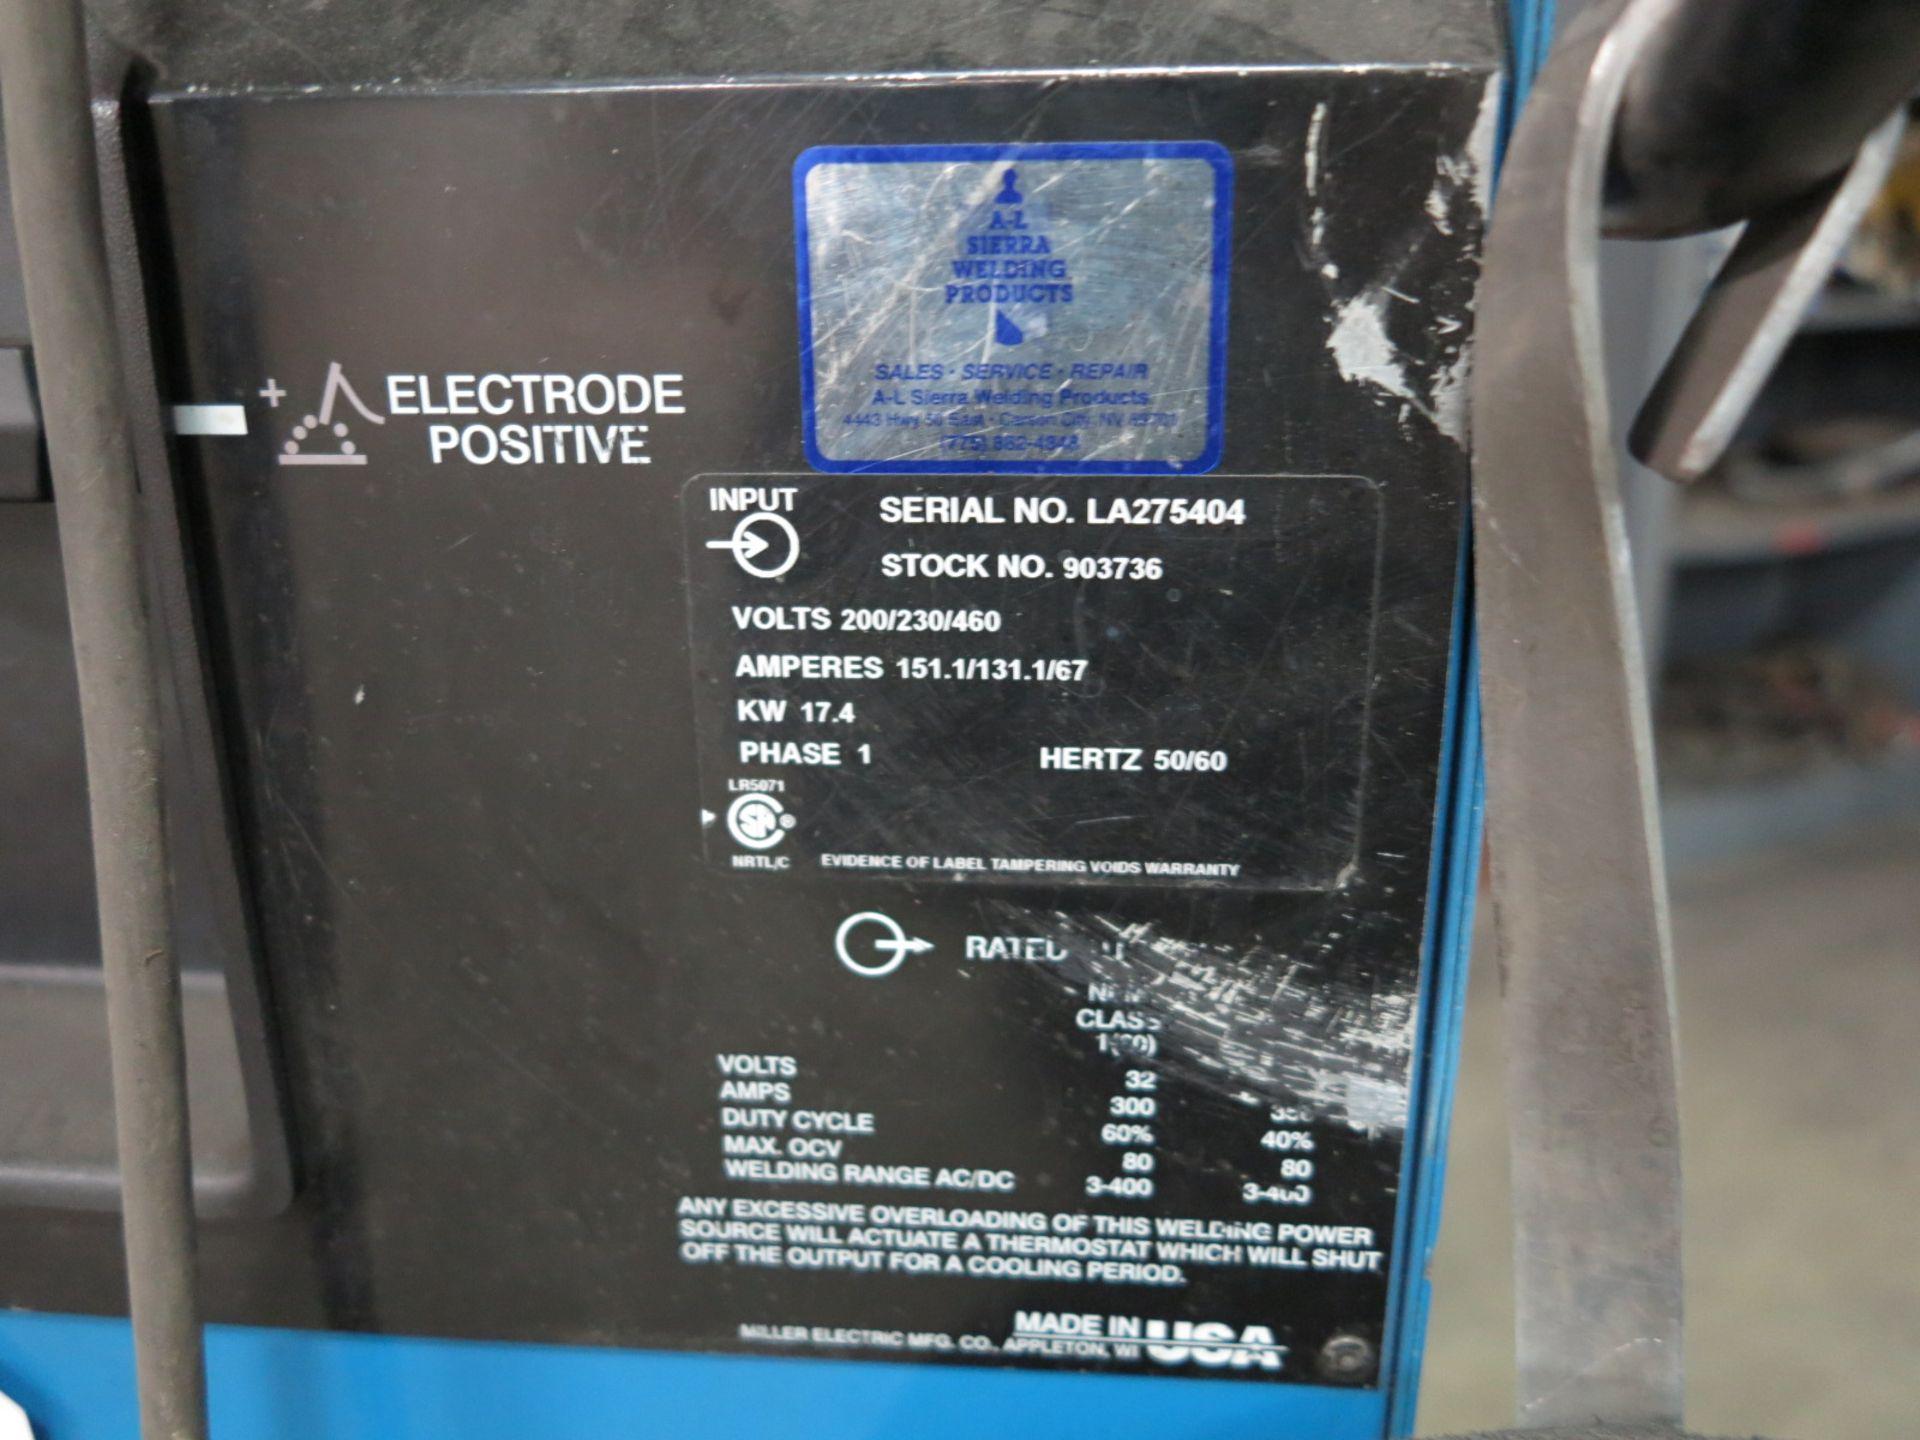 Lot 8 - MILLER SYNCROWAVE 350LX CC-AC/DC WELDER, S/N LA275404